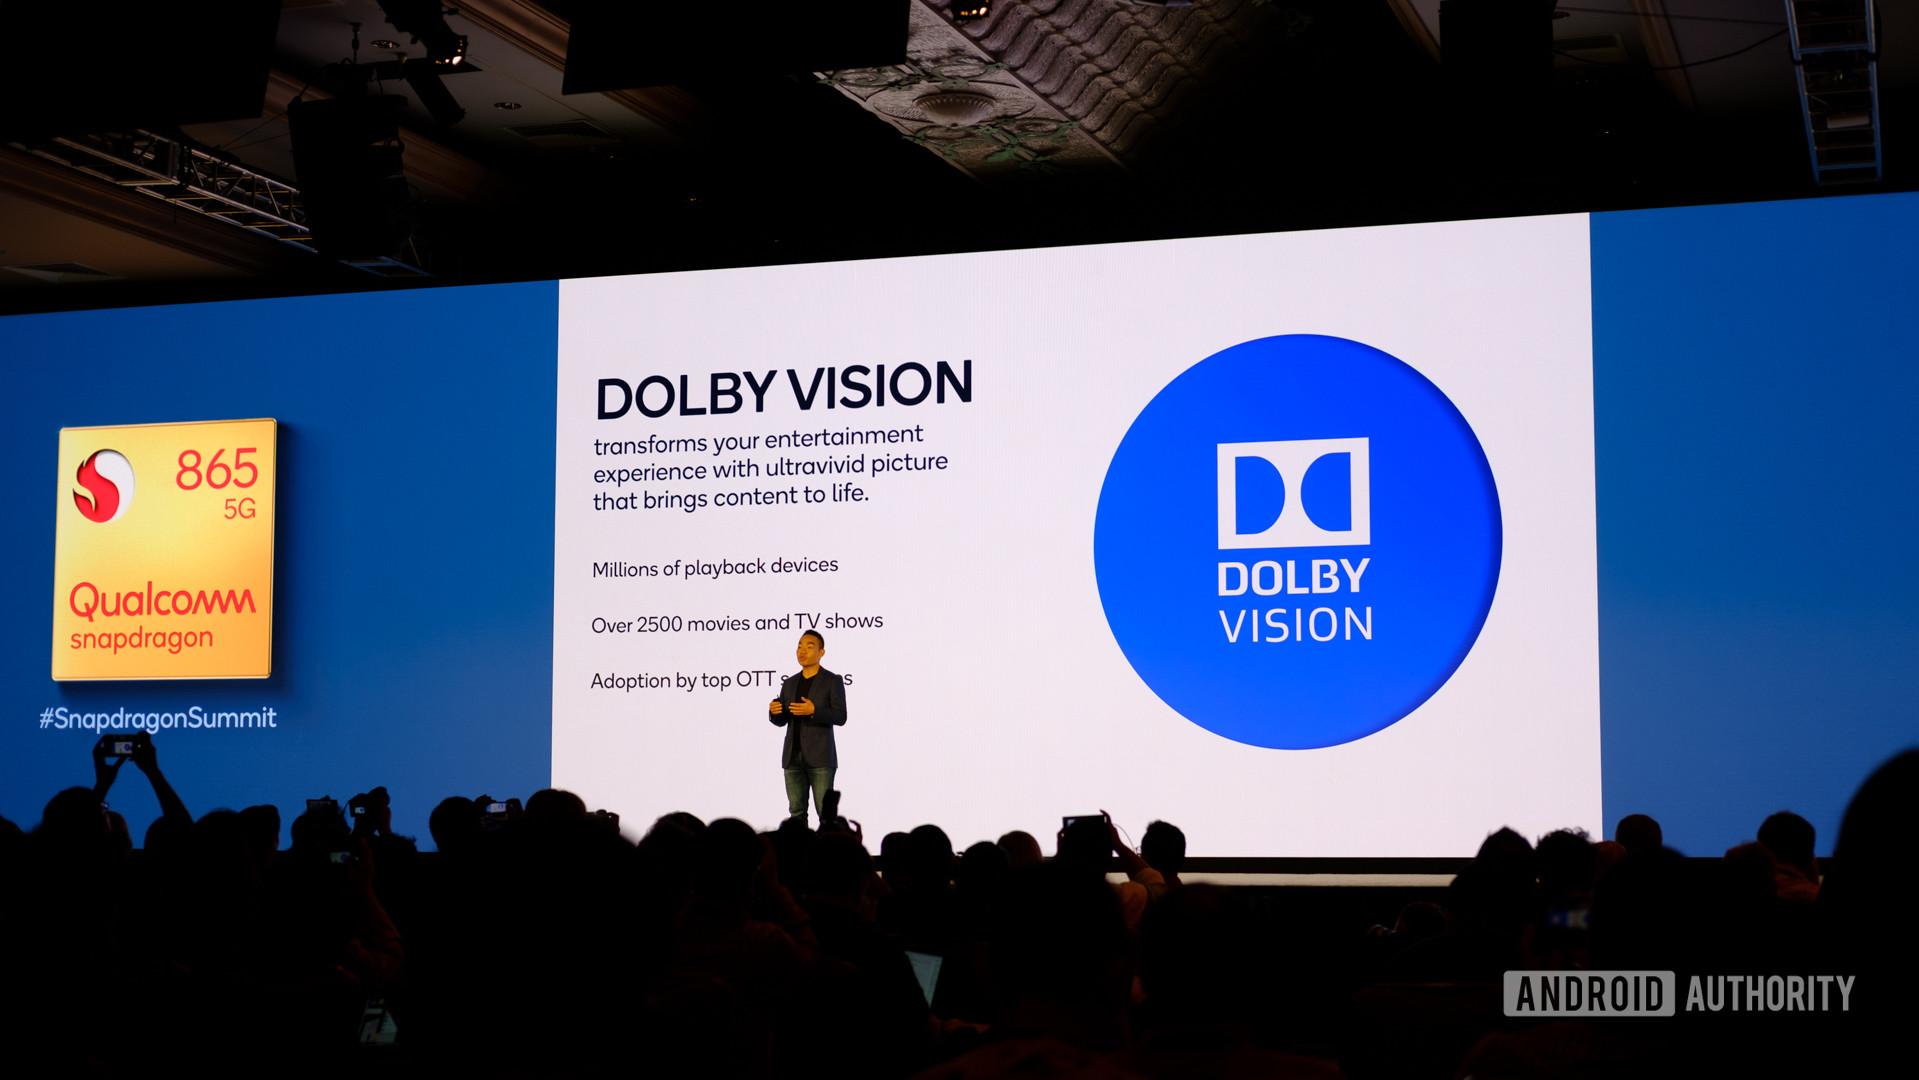 Qualcomm Snapdragon 865 Dolby Vision slides